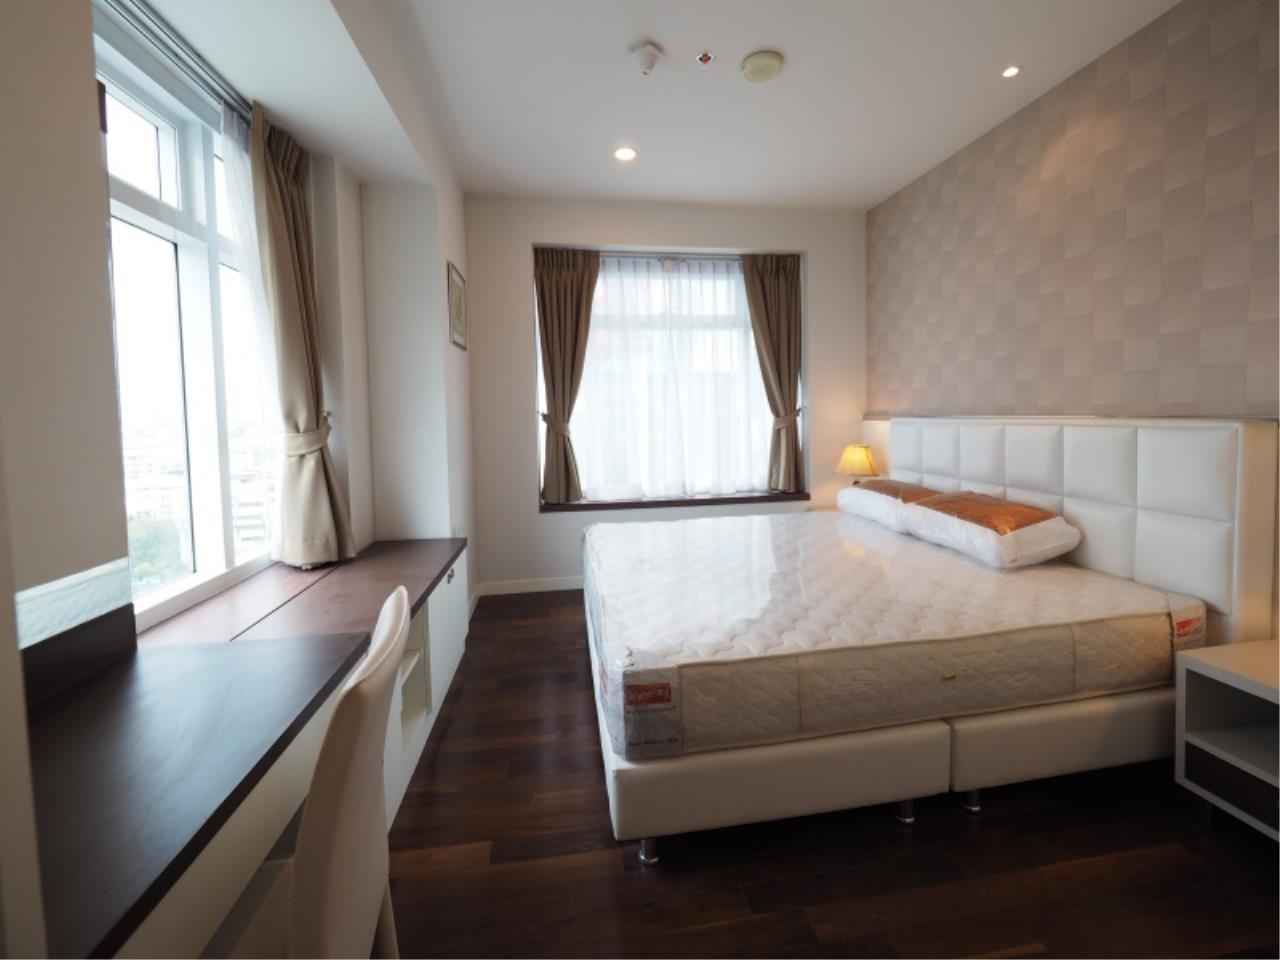 Century21 Skylux Agency's Circle Condominium / Condo For Rent / 1 Bedroom / 46 SQM / MRT Phetchaburi / Bangkok 5